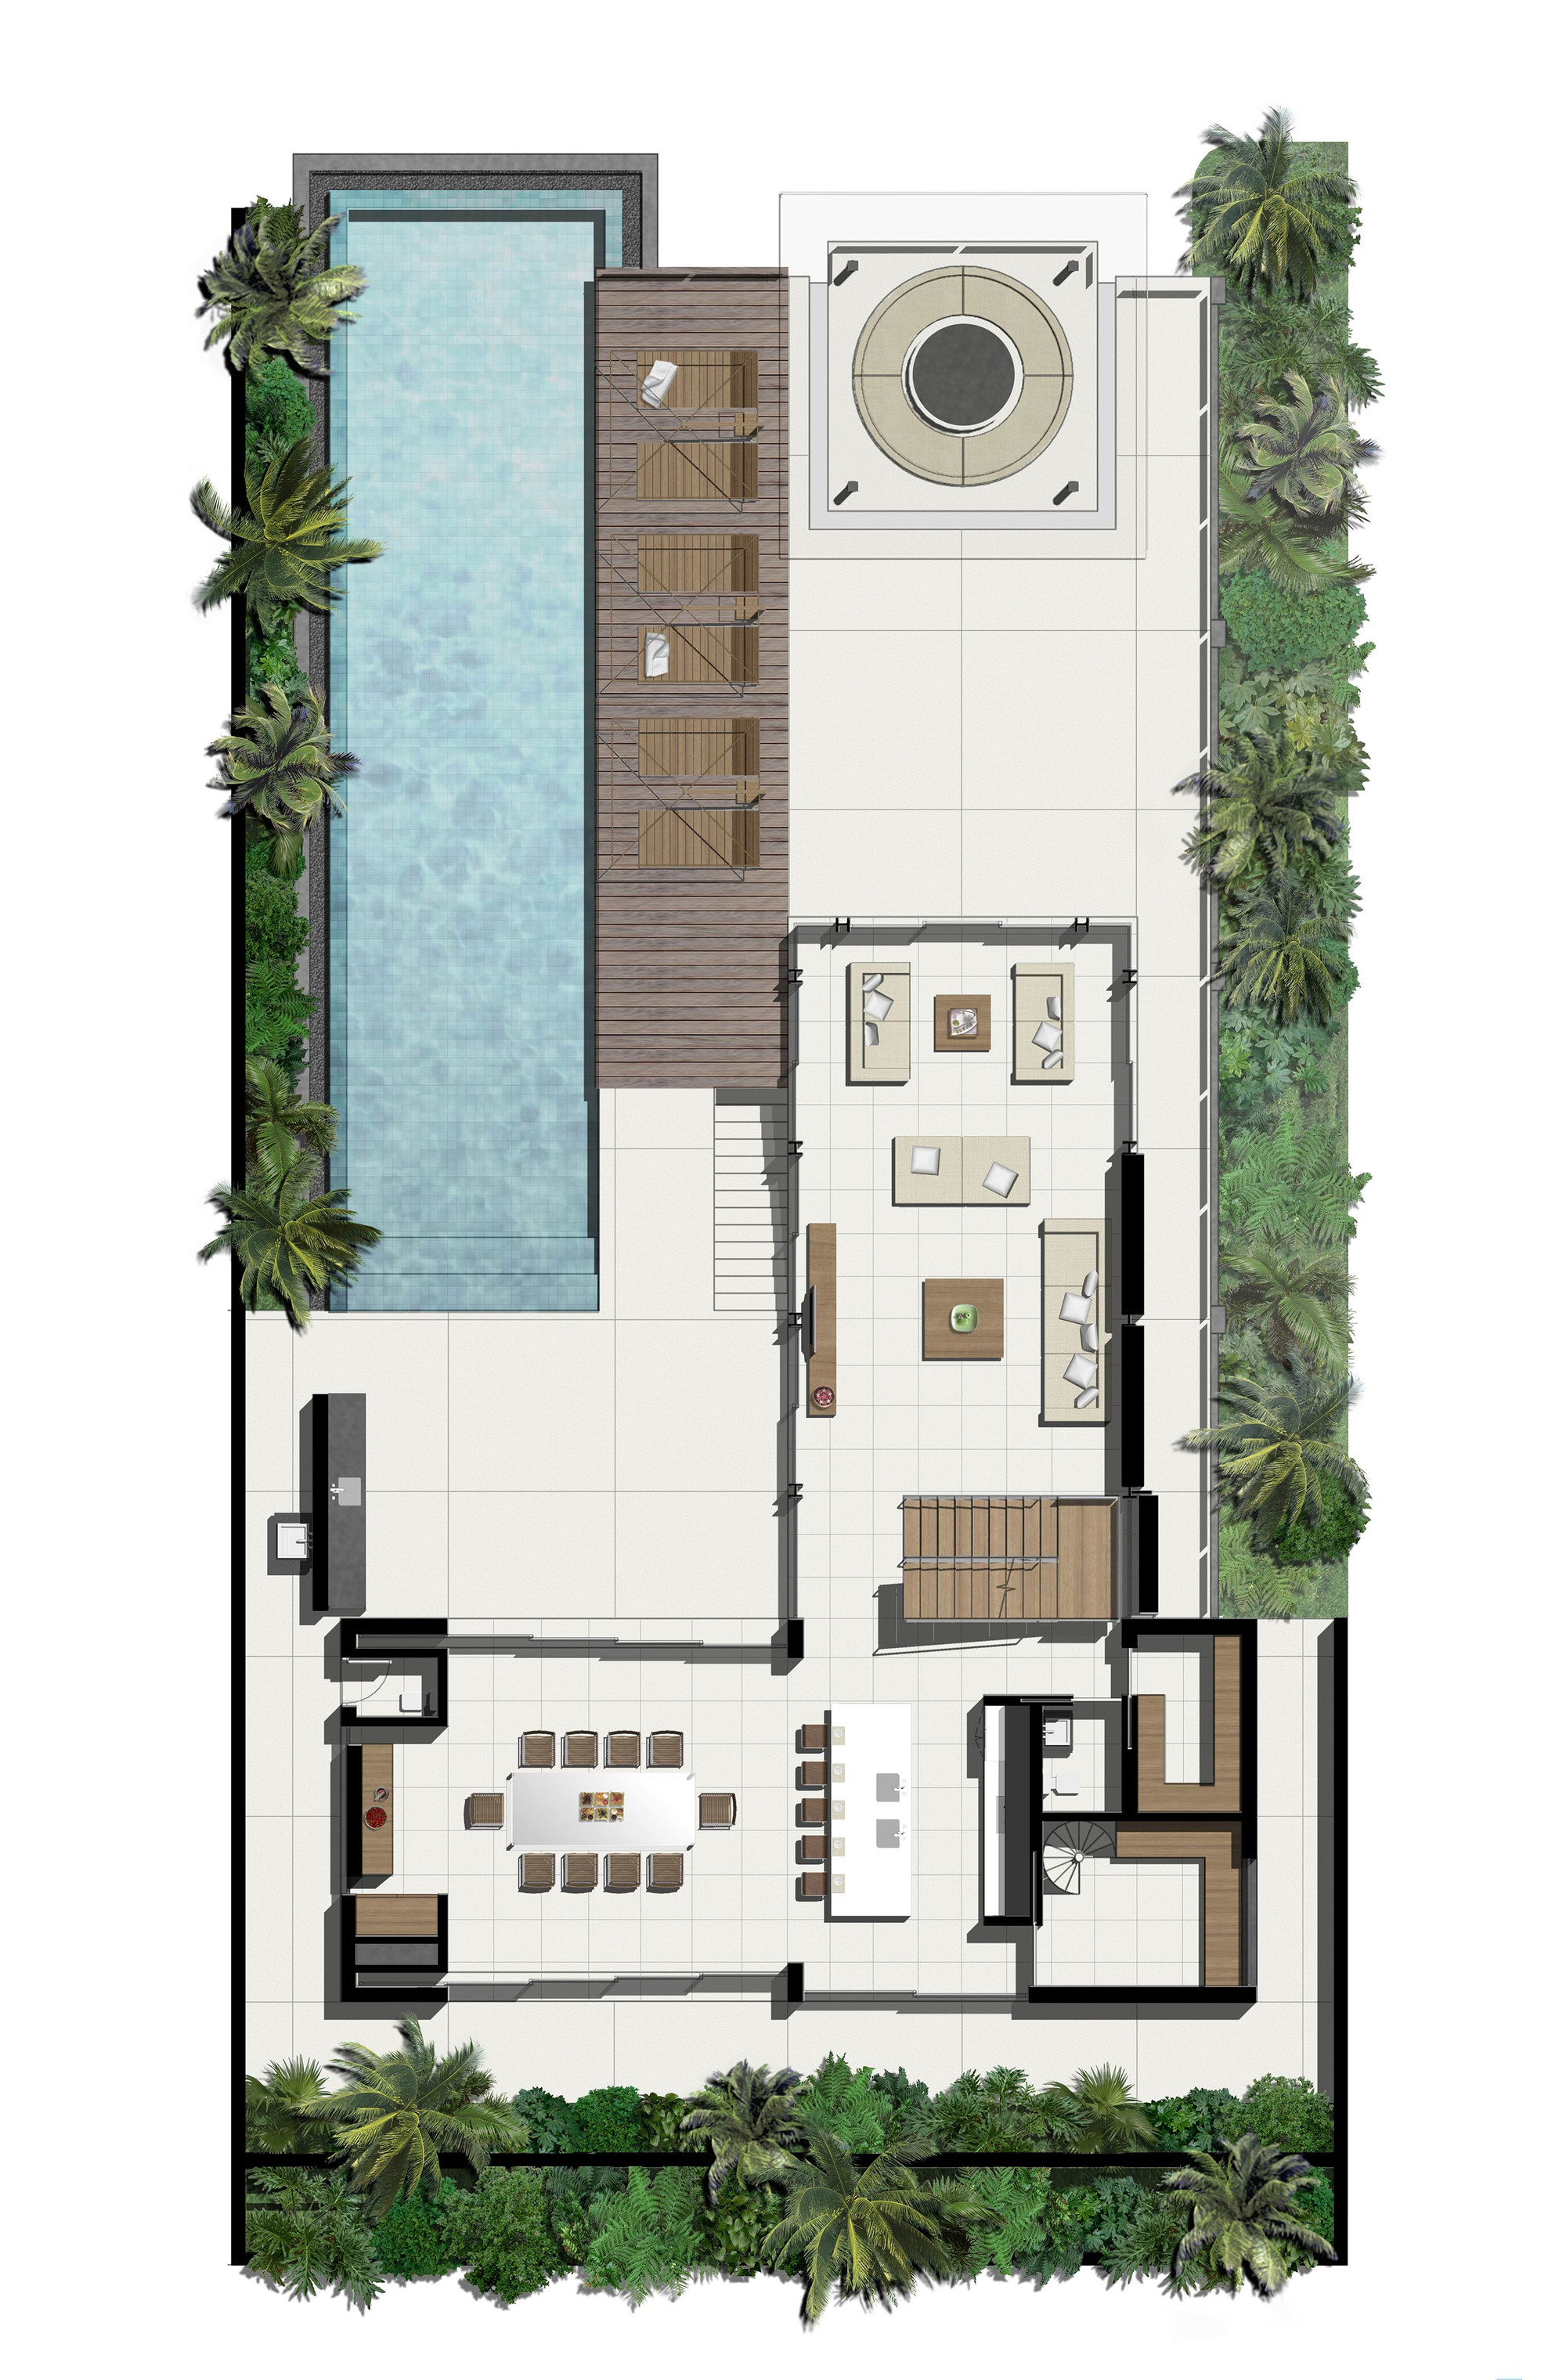 galeria de sava original vision 24. Black Bedroom Furniture Sets. Home Design Ideas